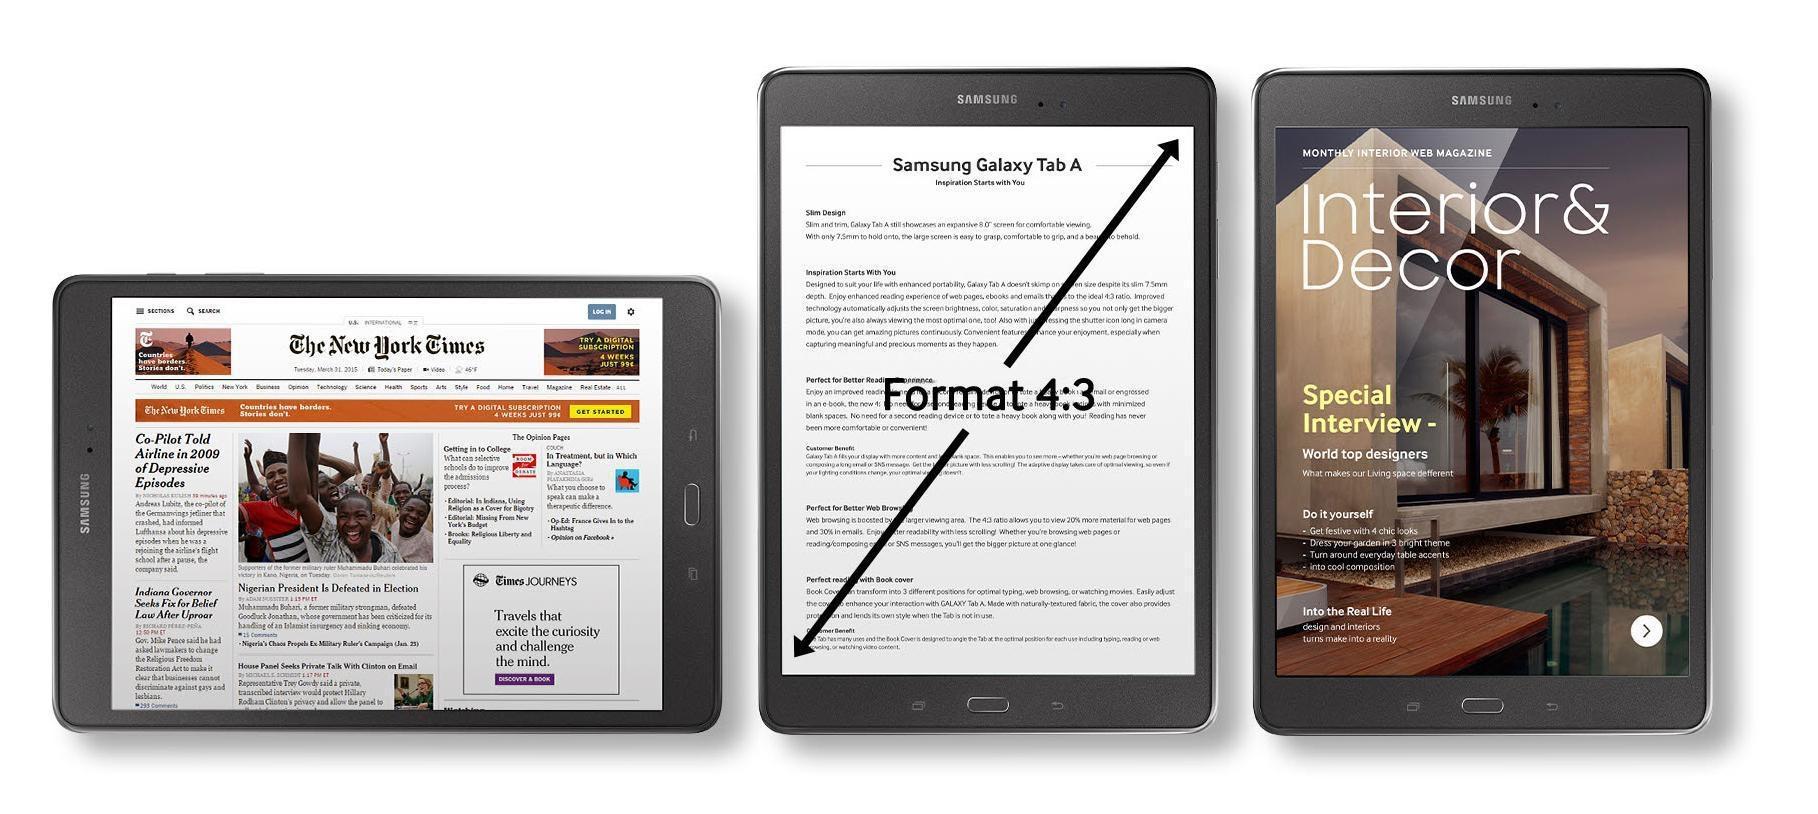 ma tablette samsung galaxy tab 4 ne charge plus. Black Bedroom Furniture Sets. Home Design Ideas